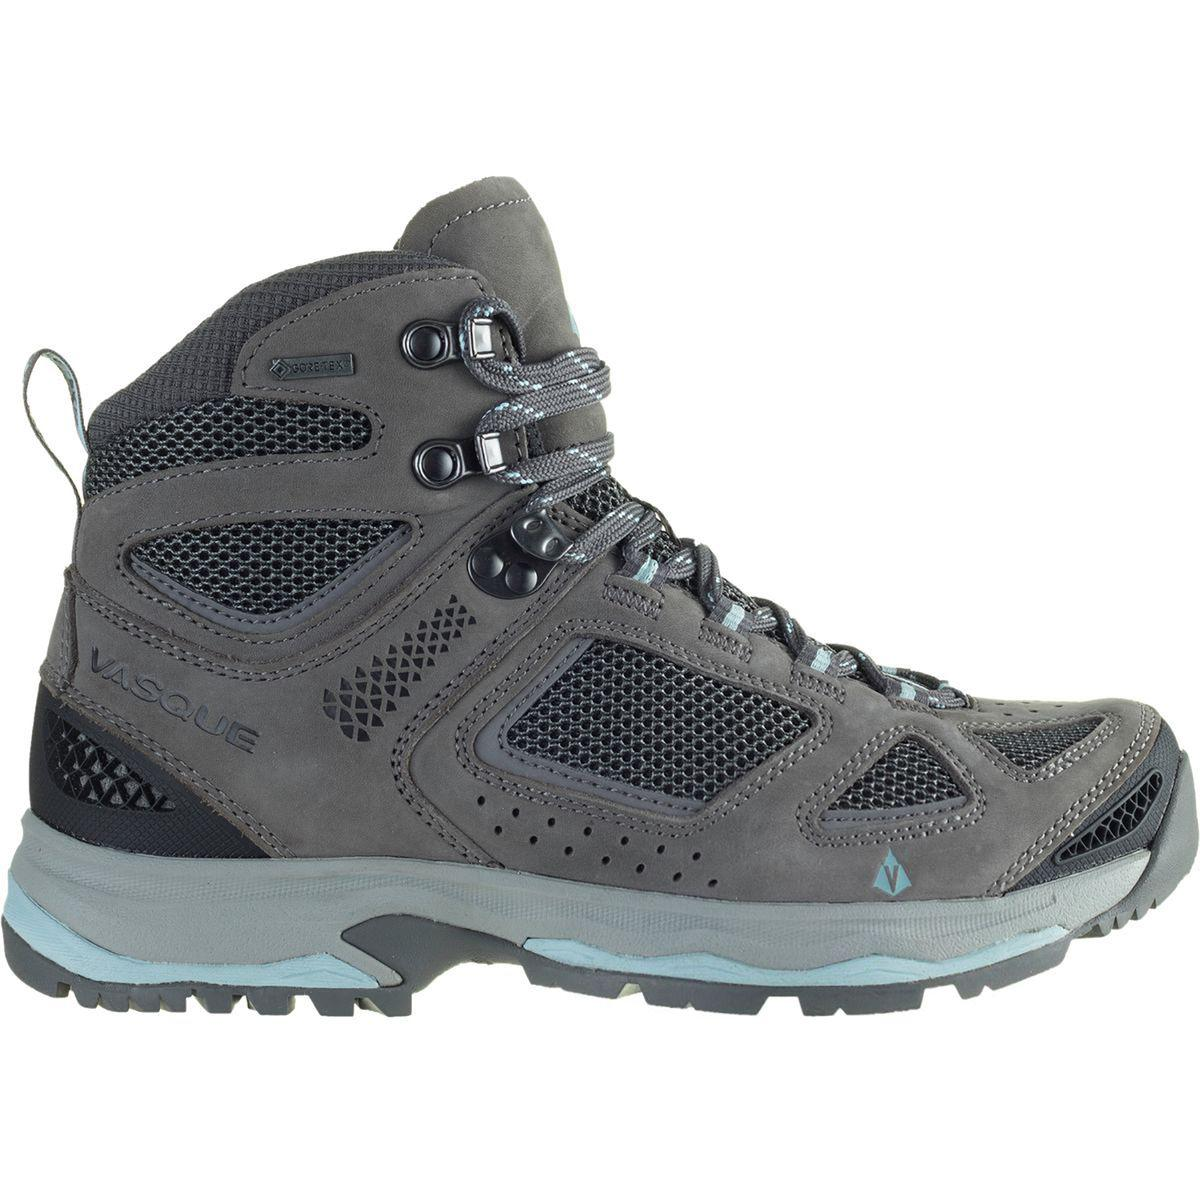 580af9f3895d Vasque - Blue Breeze Iii Gtx Hiking Boot for Men - Lyst. View fullscreen